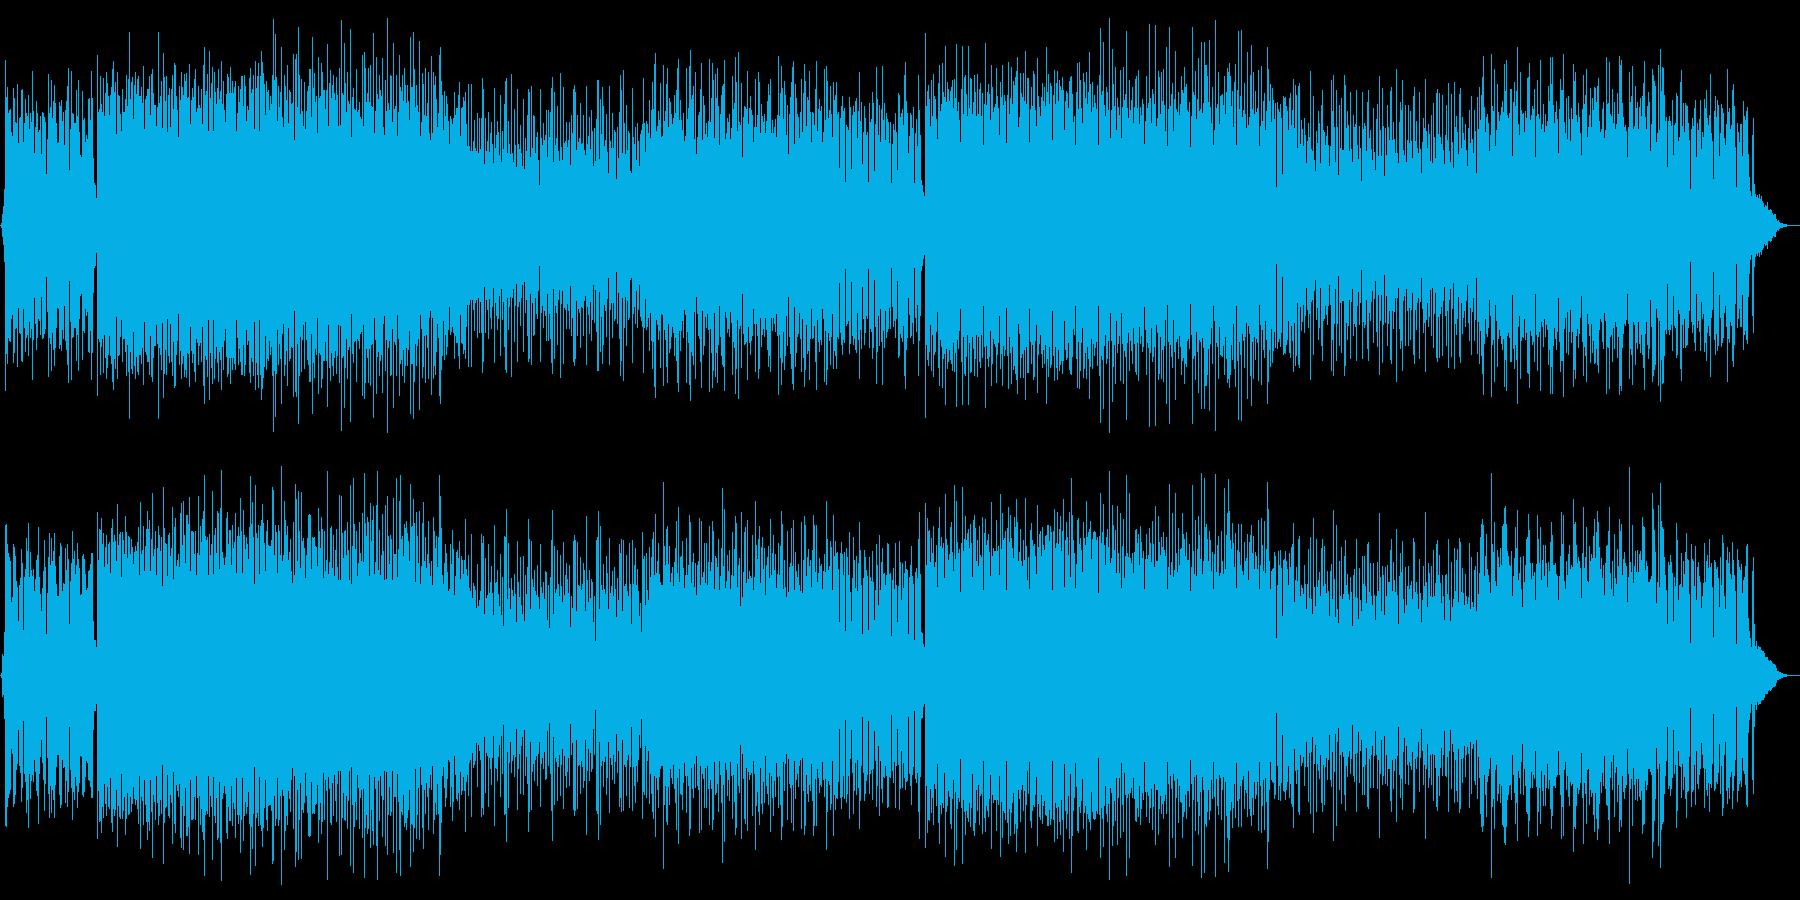 EDM ディスコ・おしゃれの再生済みの波形